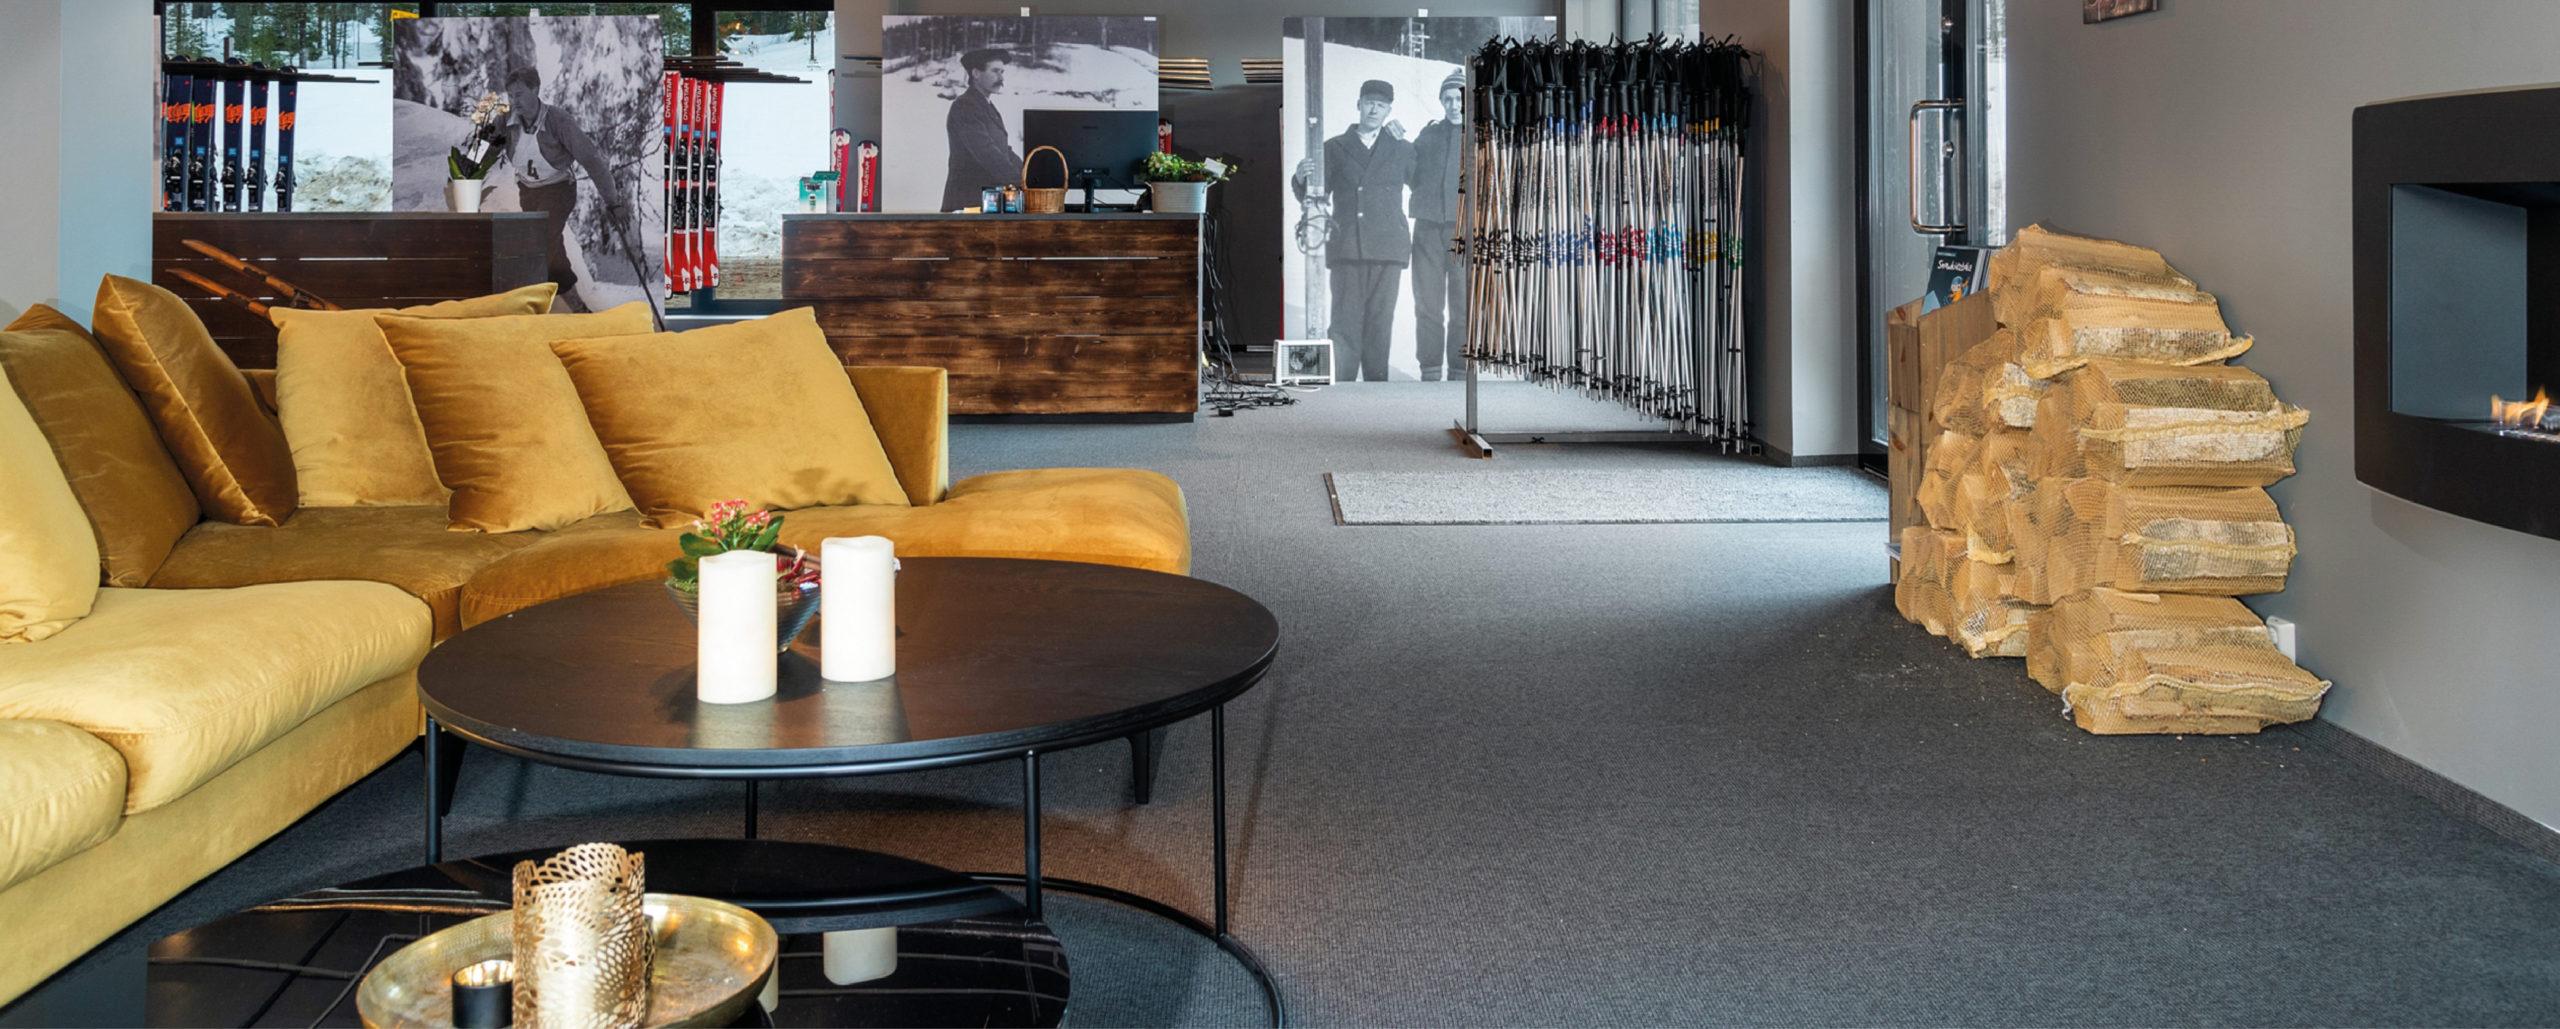 reception area and ski rental - booktrysilonline